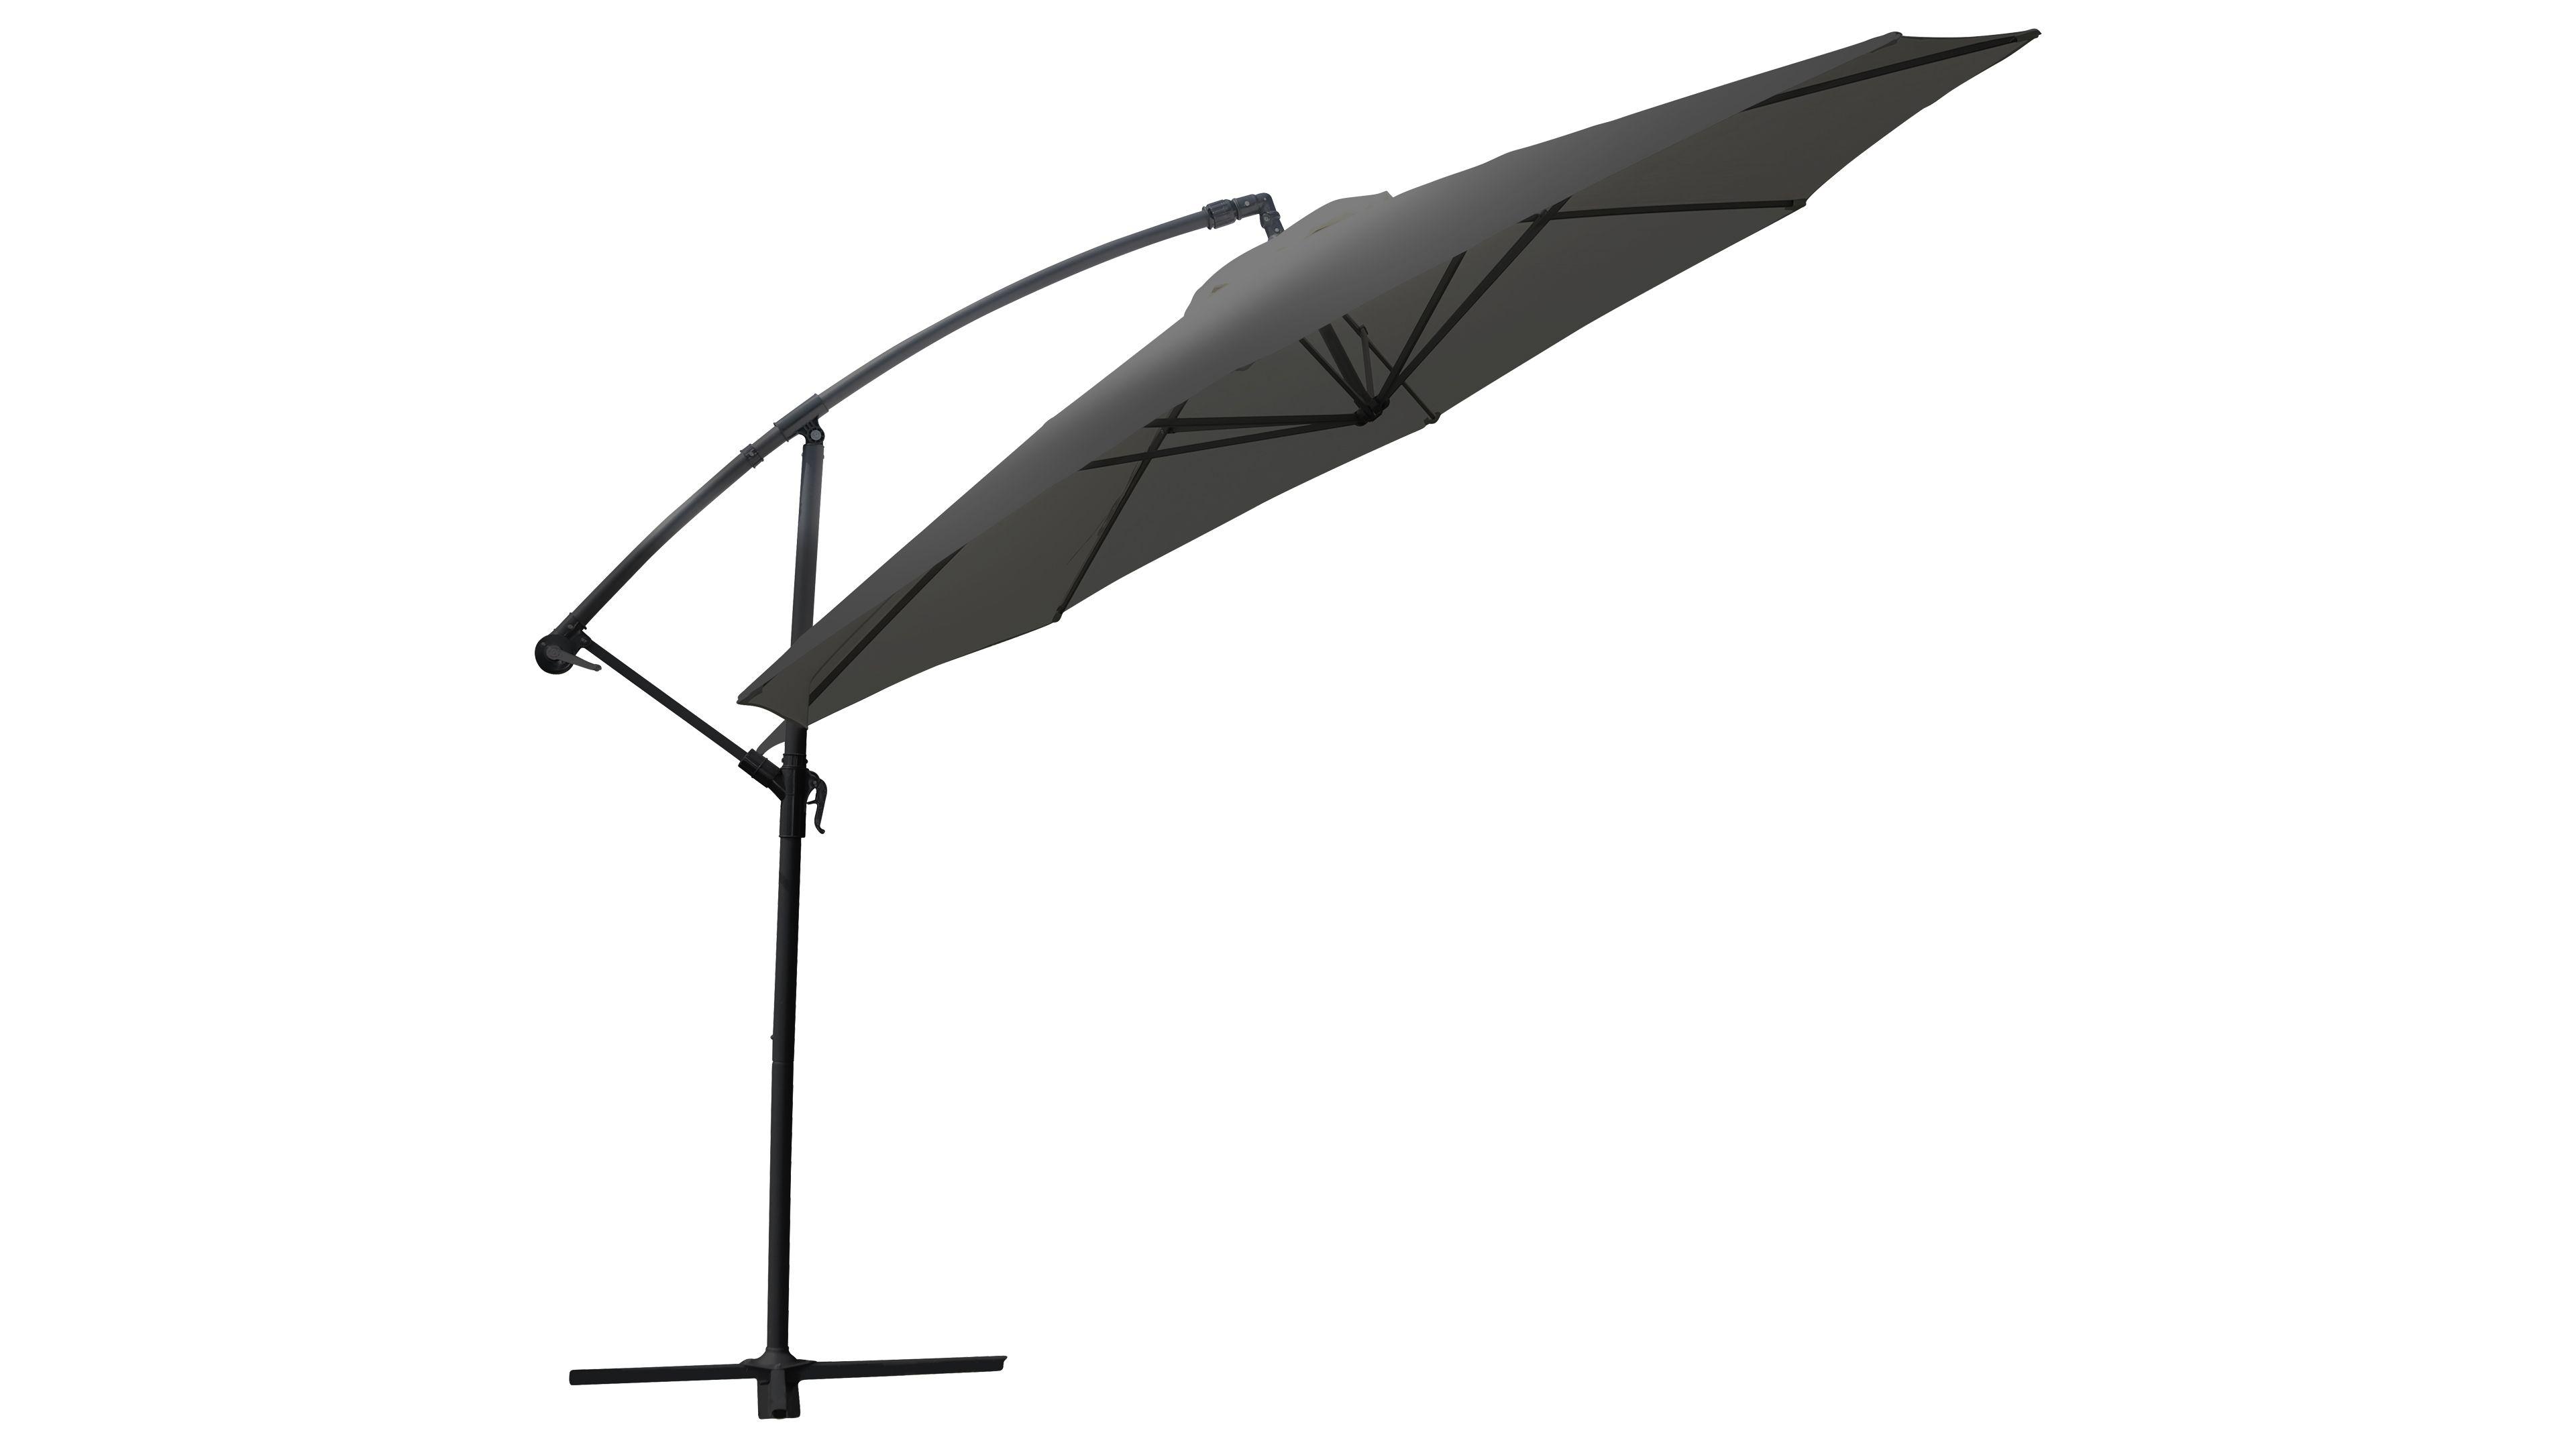 Parasol Rectangulaire Inclinable Castorama Inspirant Photographie Parasol Dport Castorama Best Ideas About Castorama Jardin